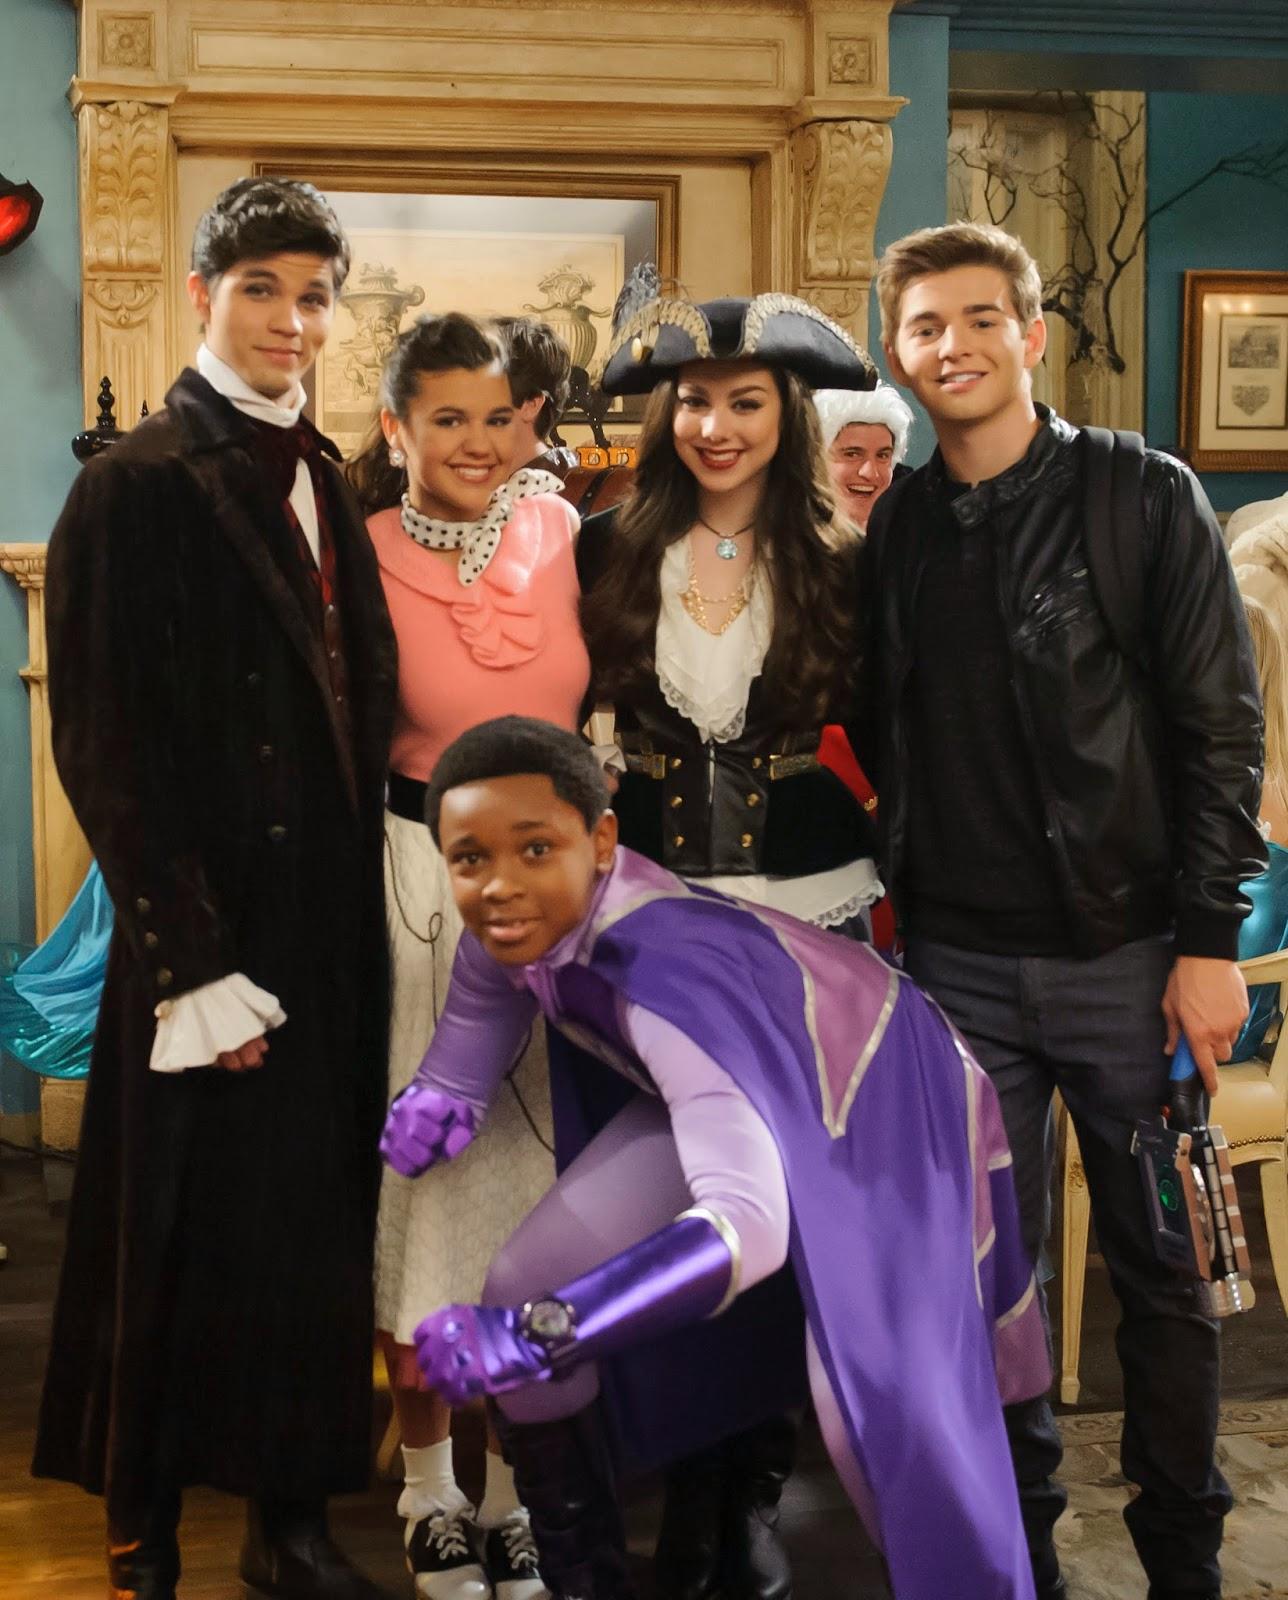 Nickelodeon Thundermans : nickelodeon, thundermans, NickALive!:, Nickelodeon, Premiere, Brand-New, Halloween, Specials,